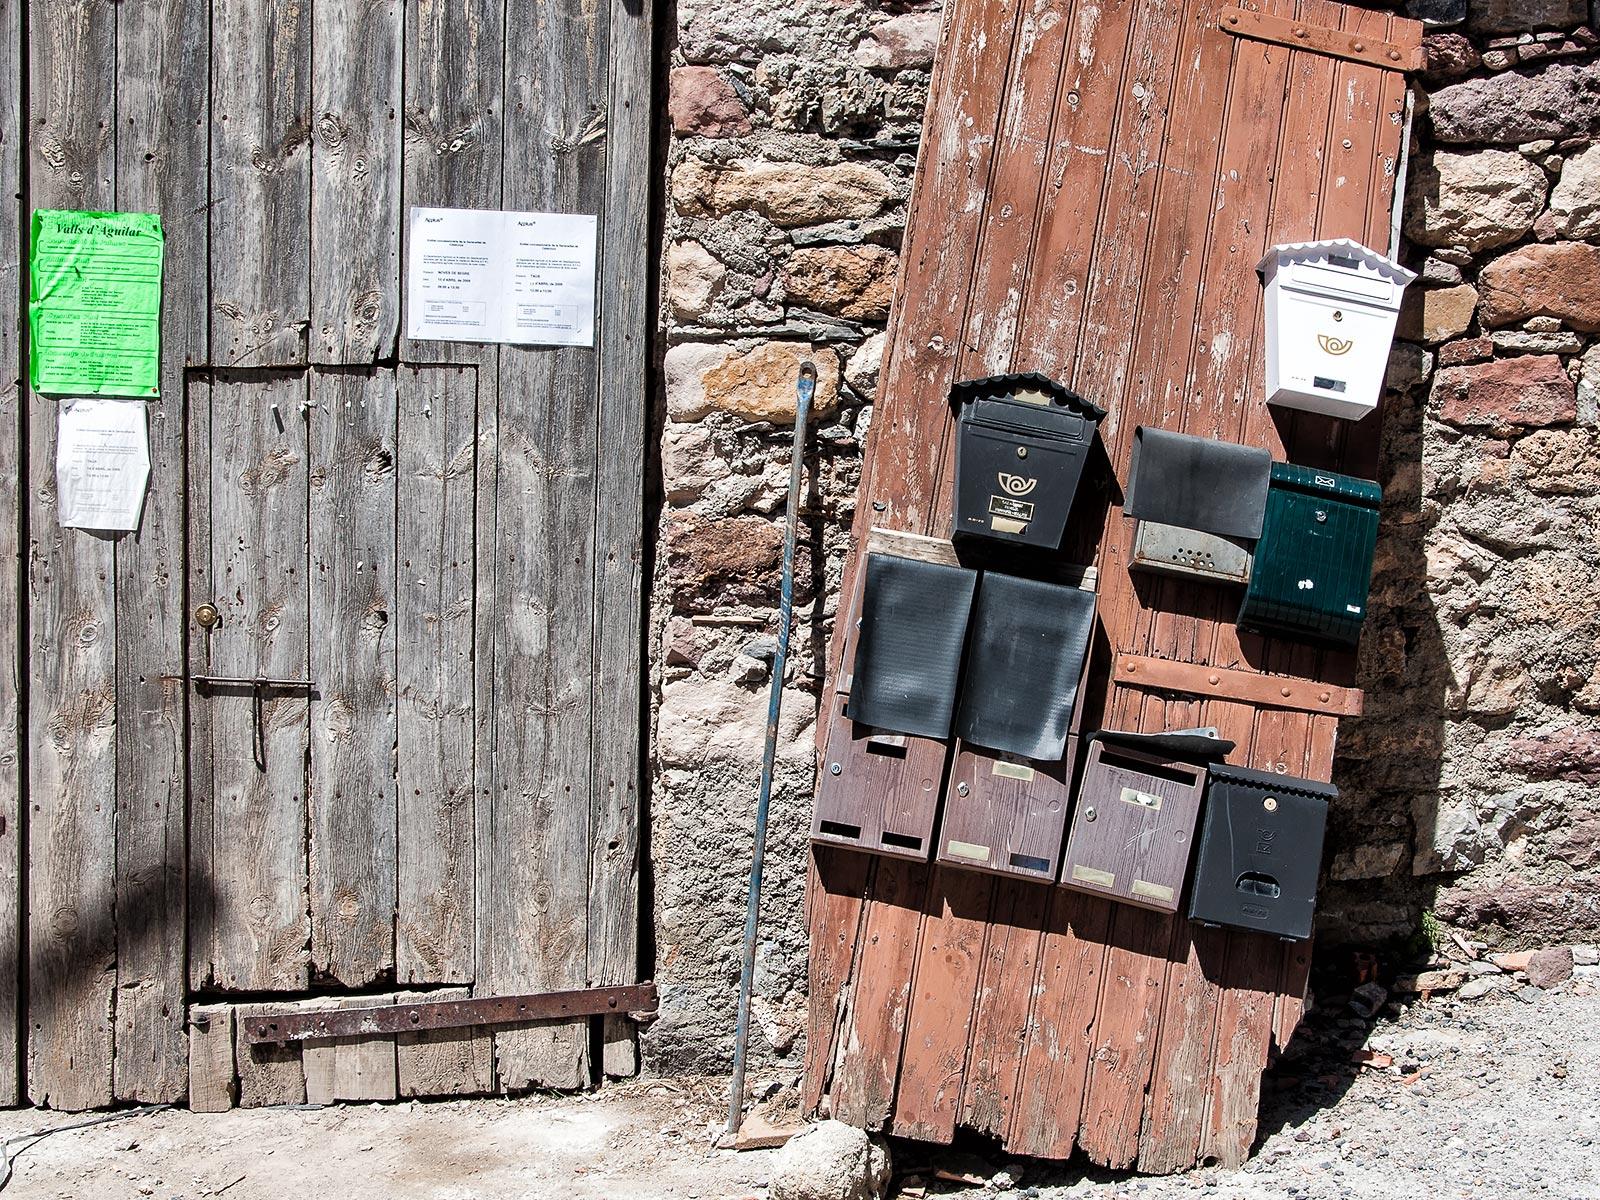 Taus, Lleida